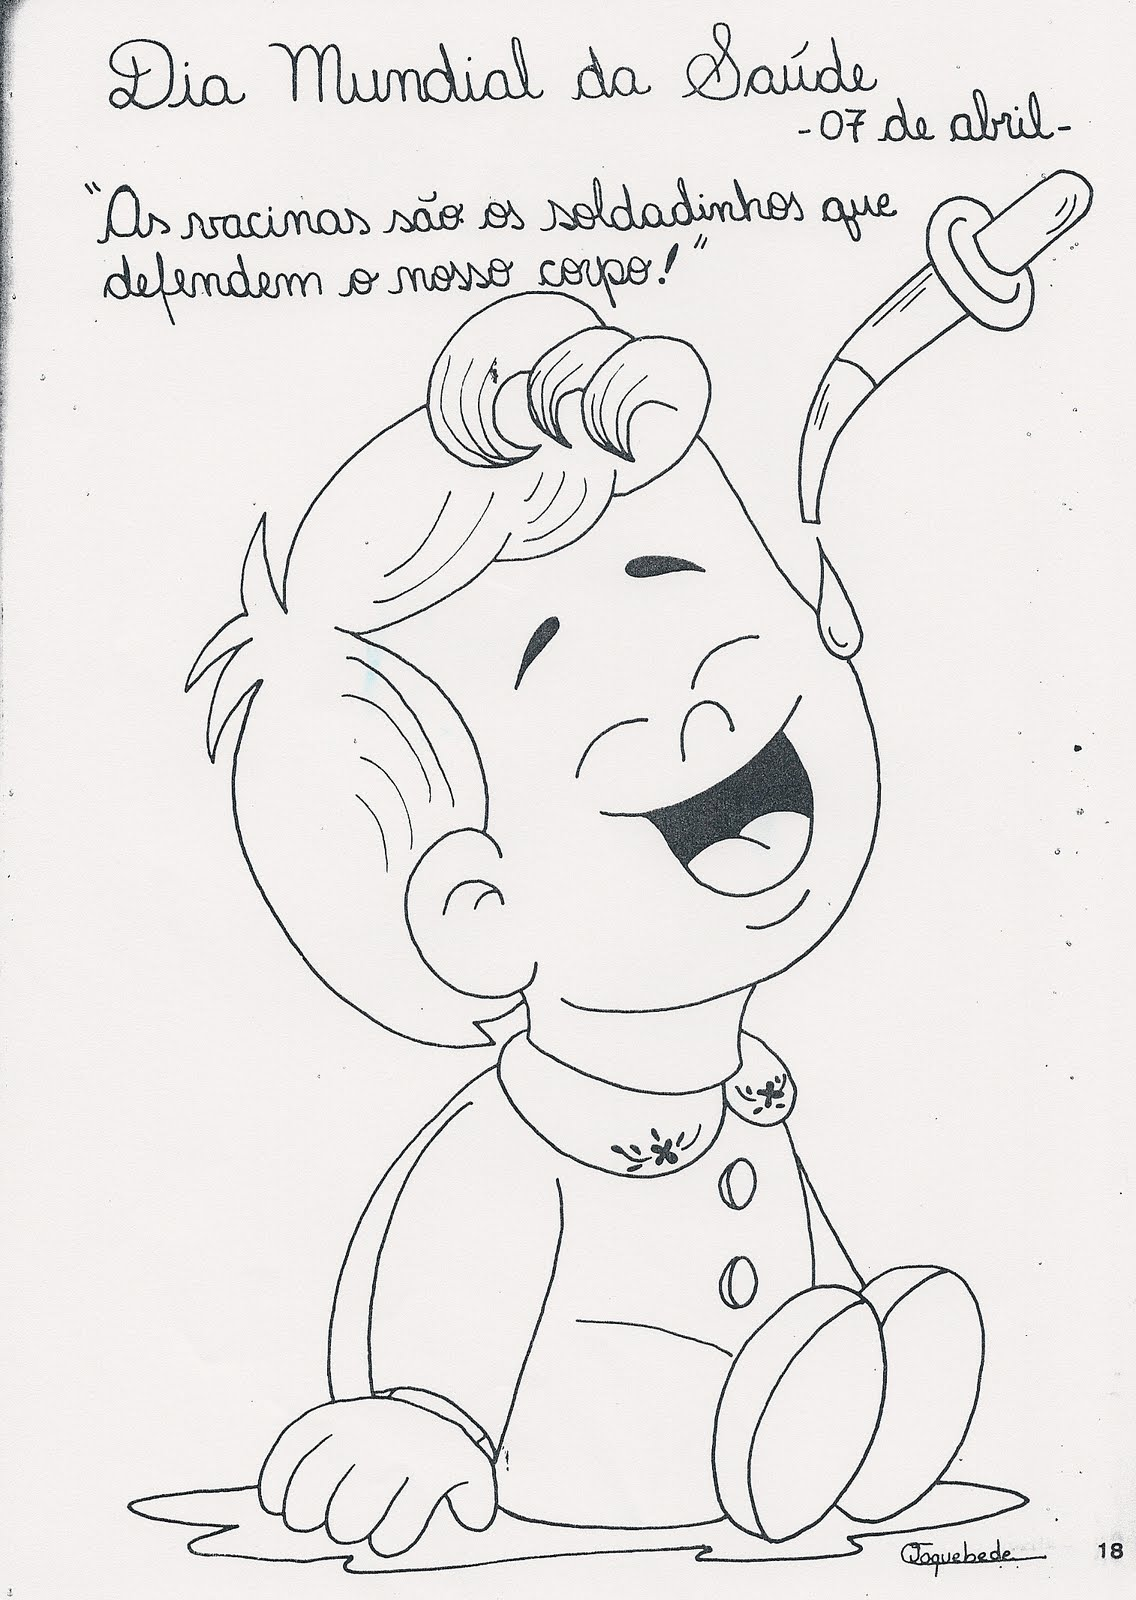 cdi centro de desenvolvimento 1ª infancia desenho para colorir